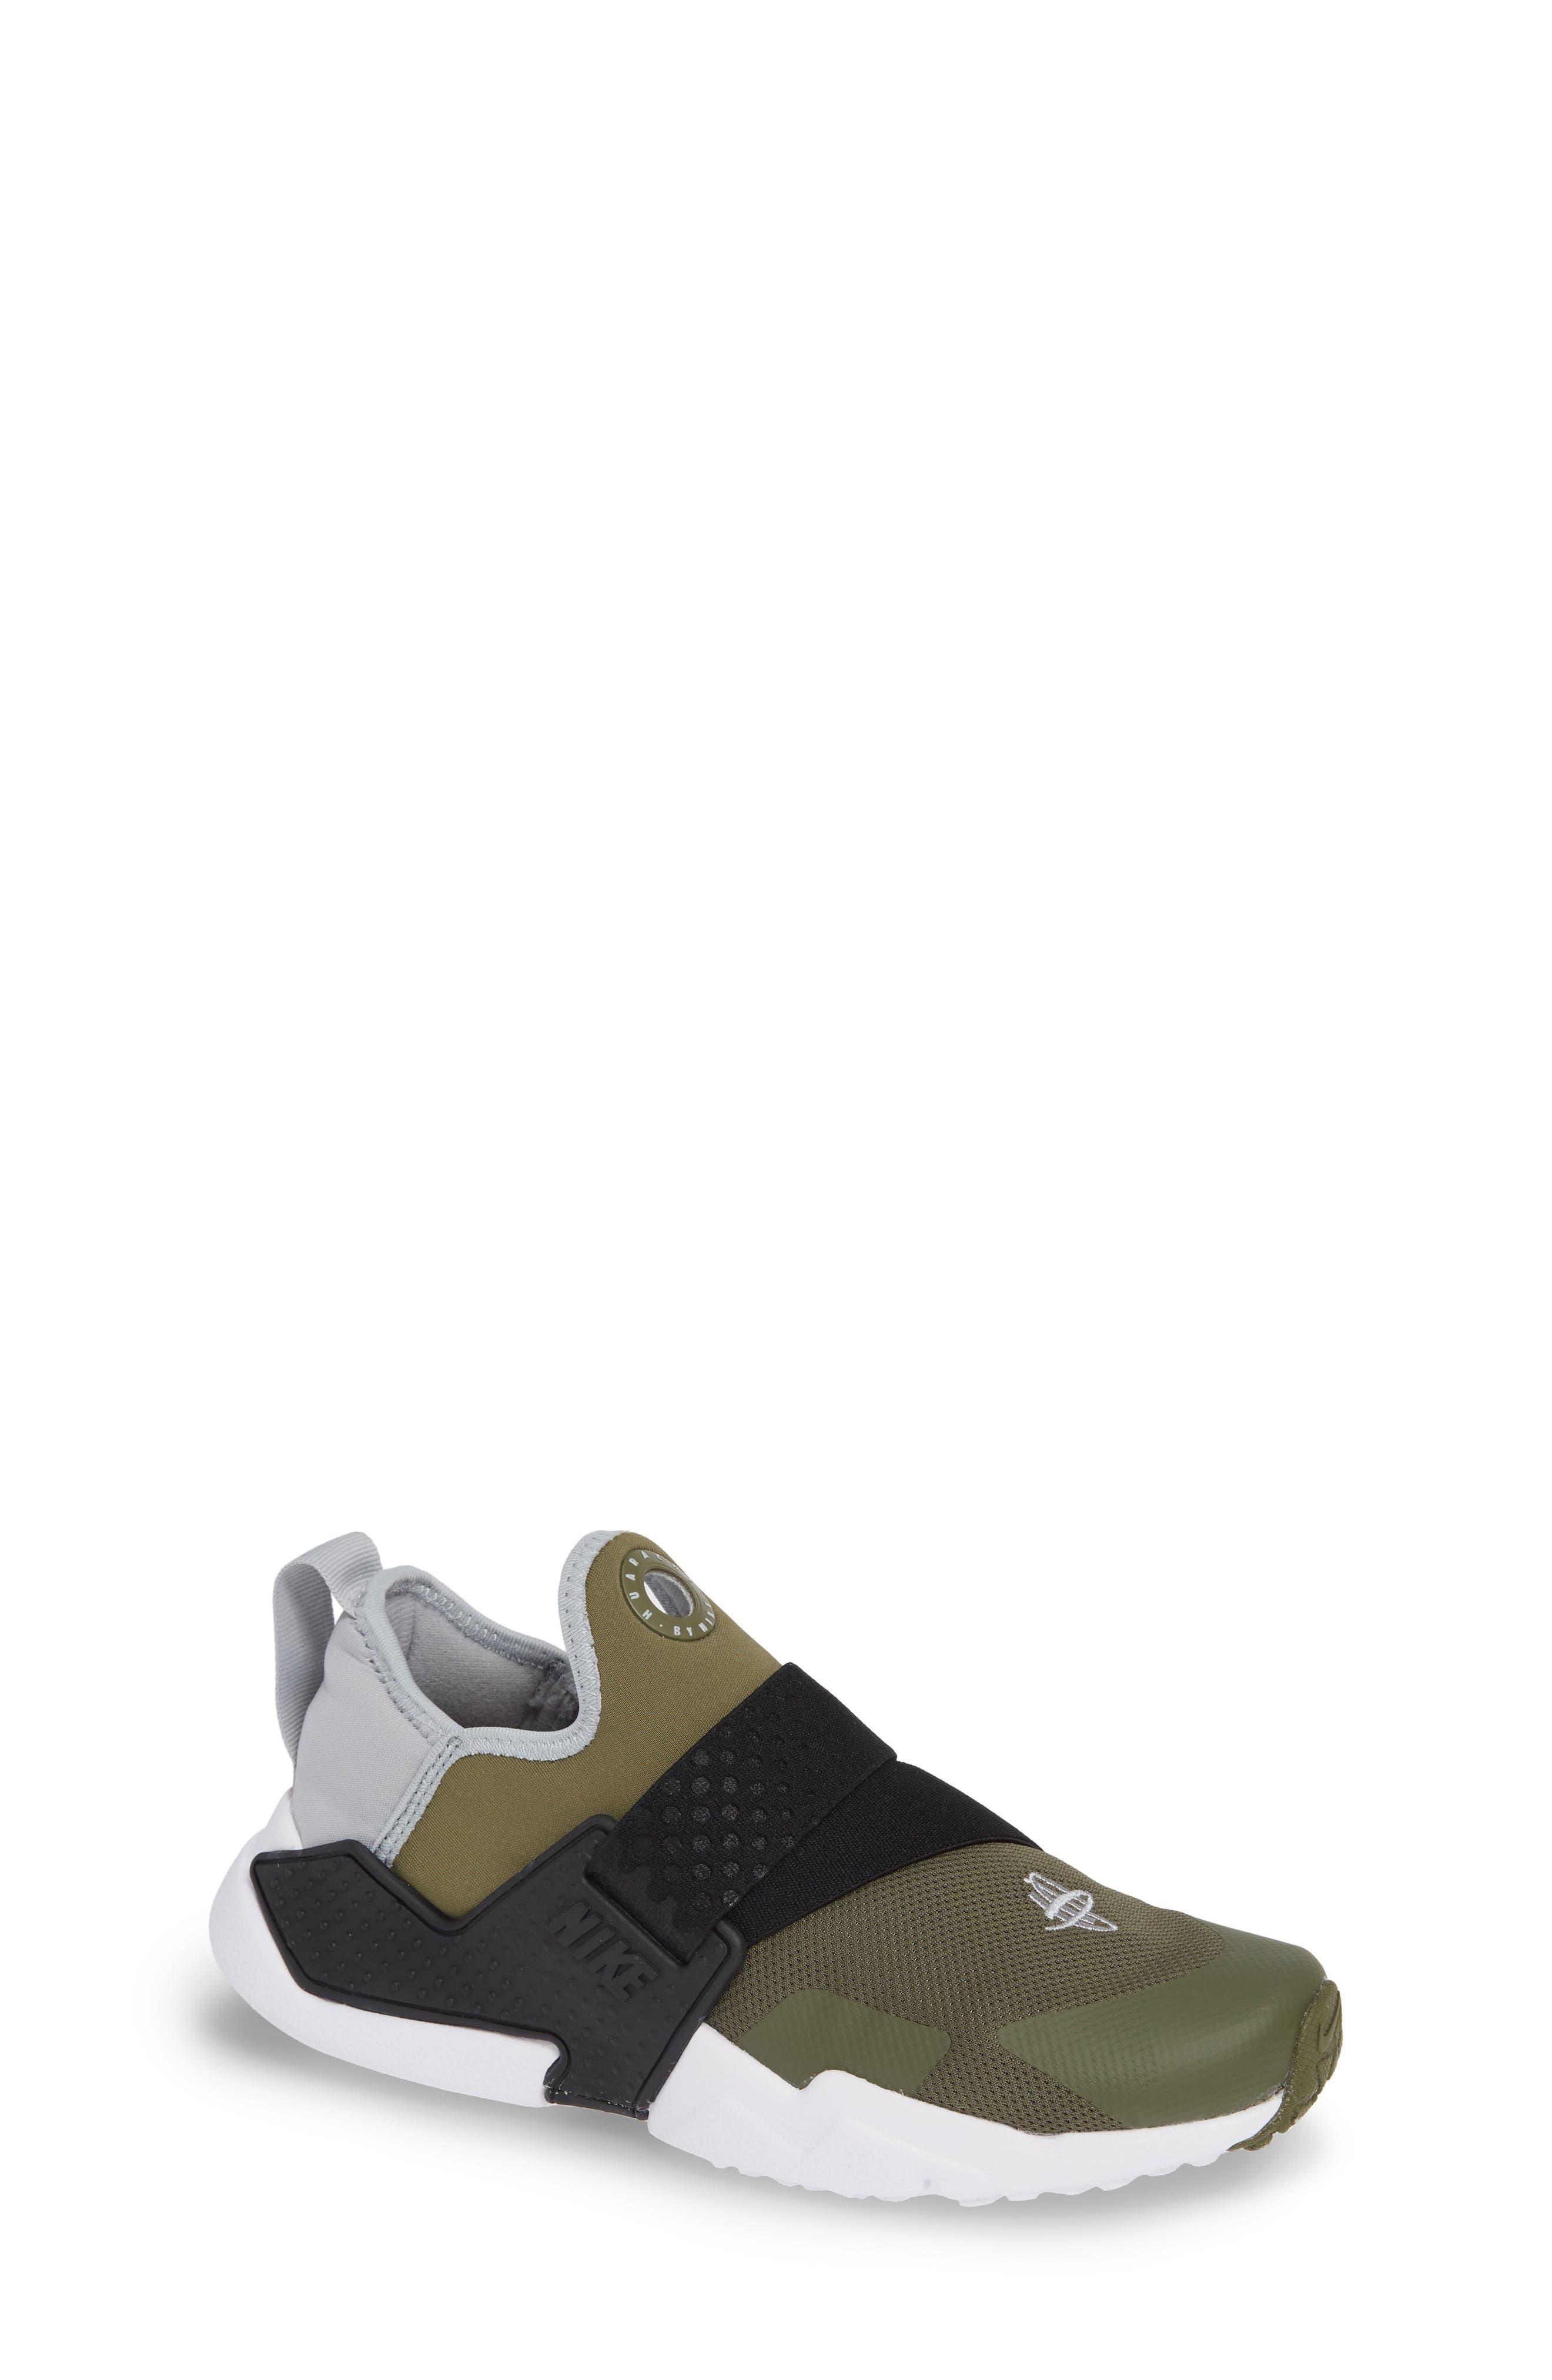 Huarache Extreme Sneaker,                             Main thumbnail 1, color,                             Olive/ Wolf Grey/ Black/ White